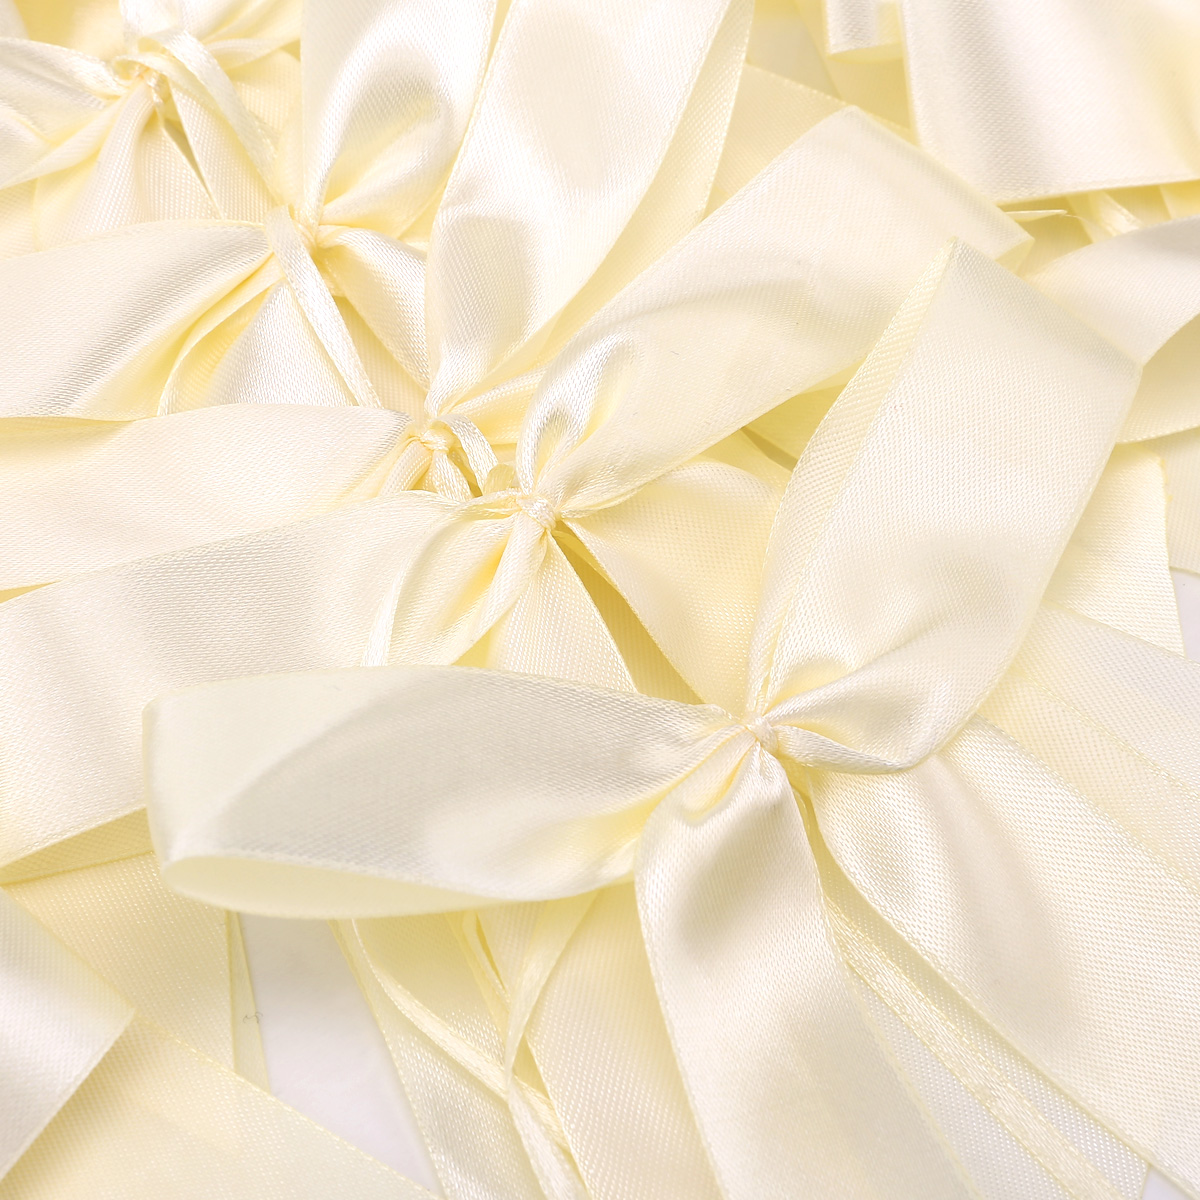 Ivory Pull Bows Satin Ribbon Decorations Wedding Pew Gift Party EBay